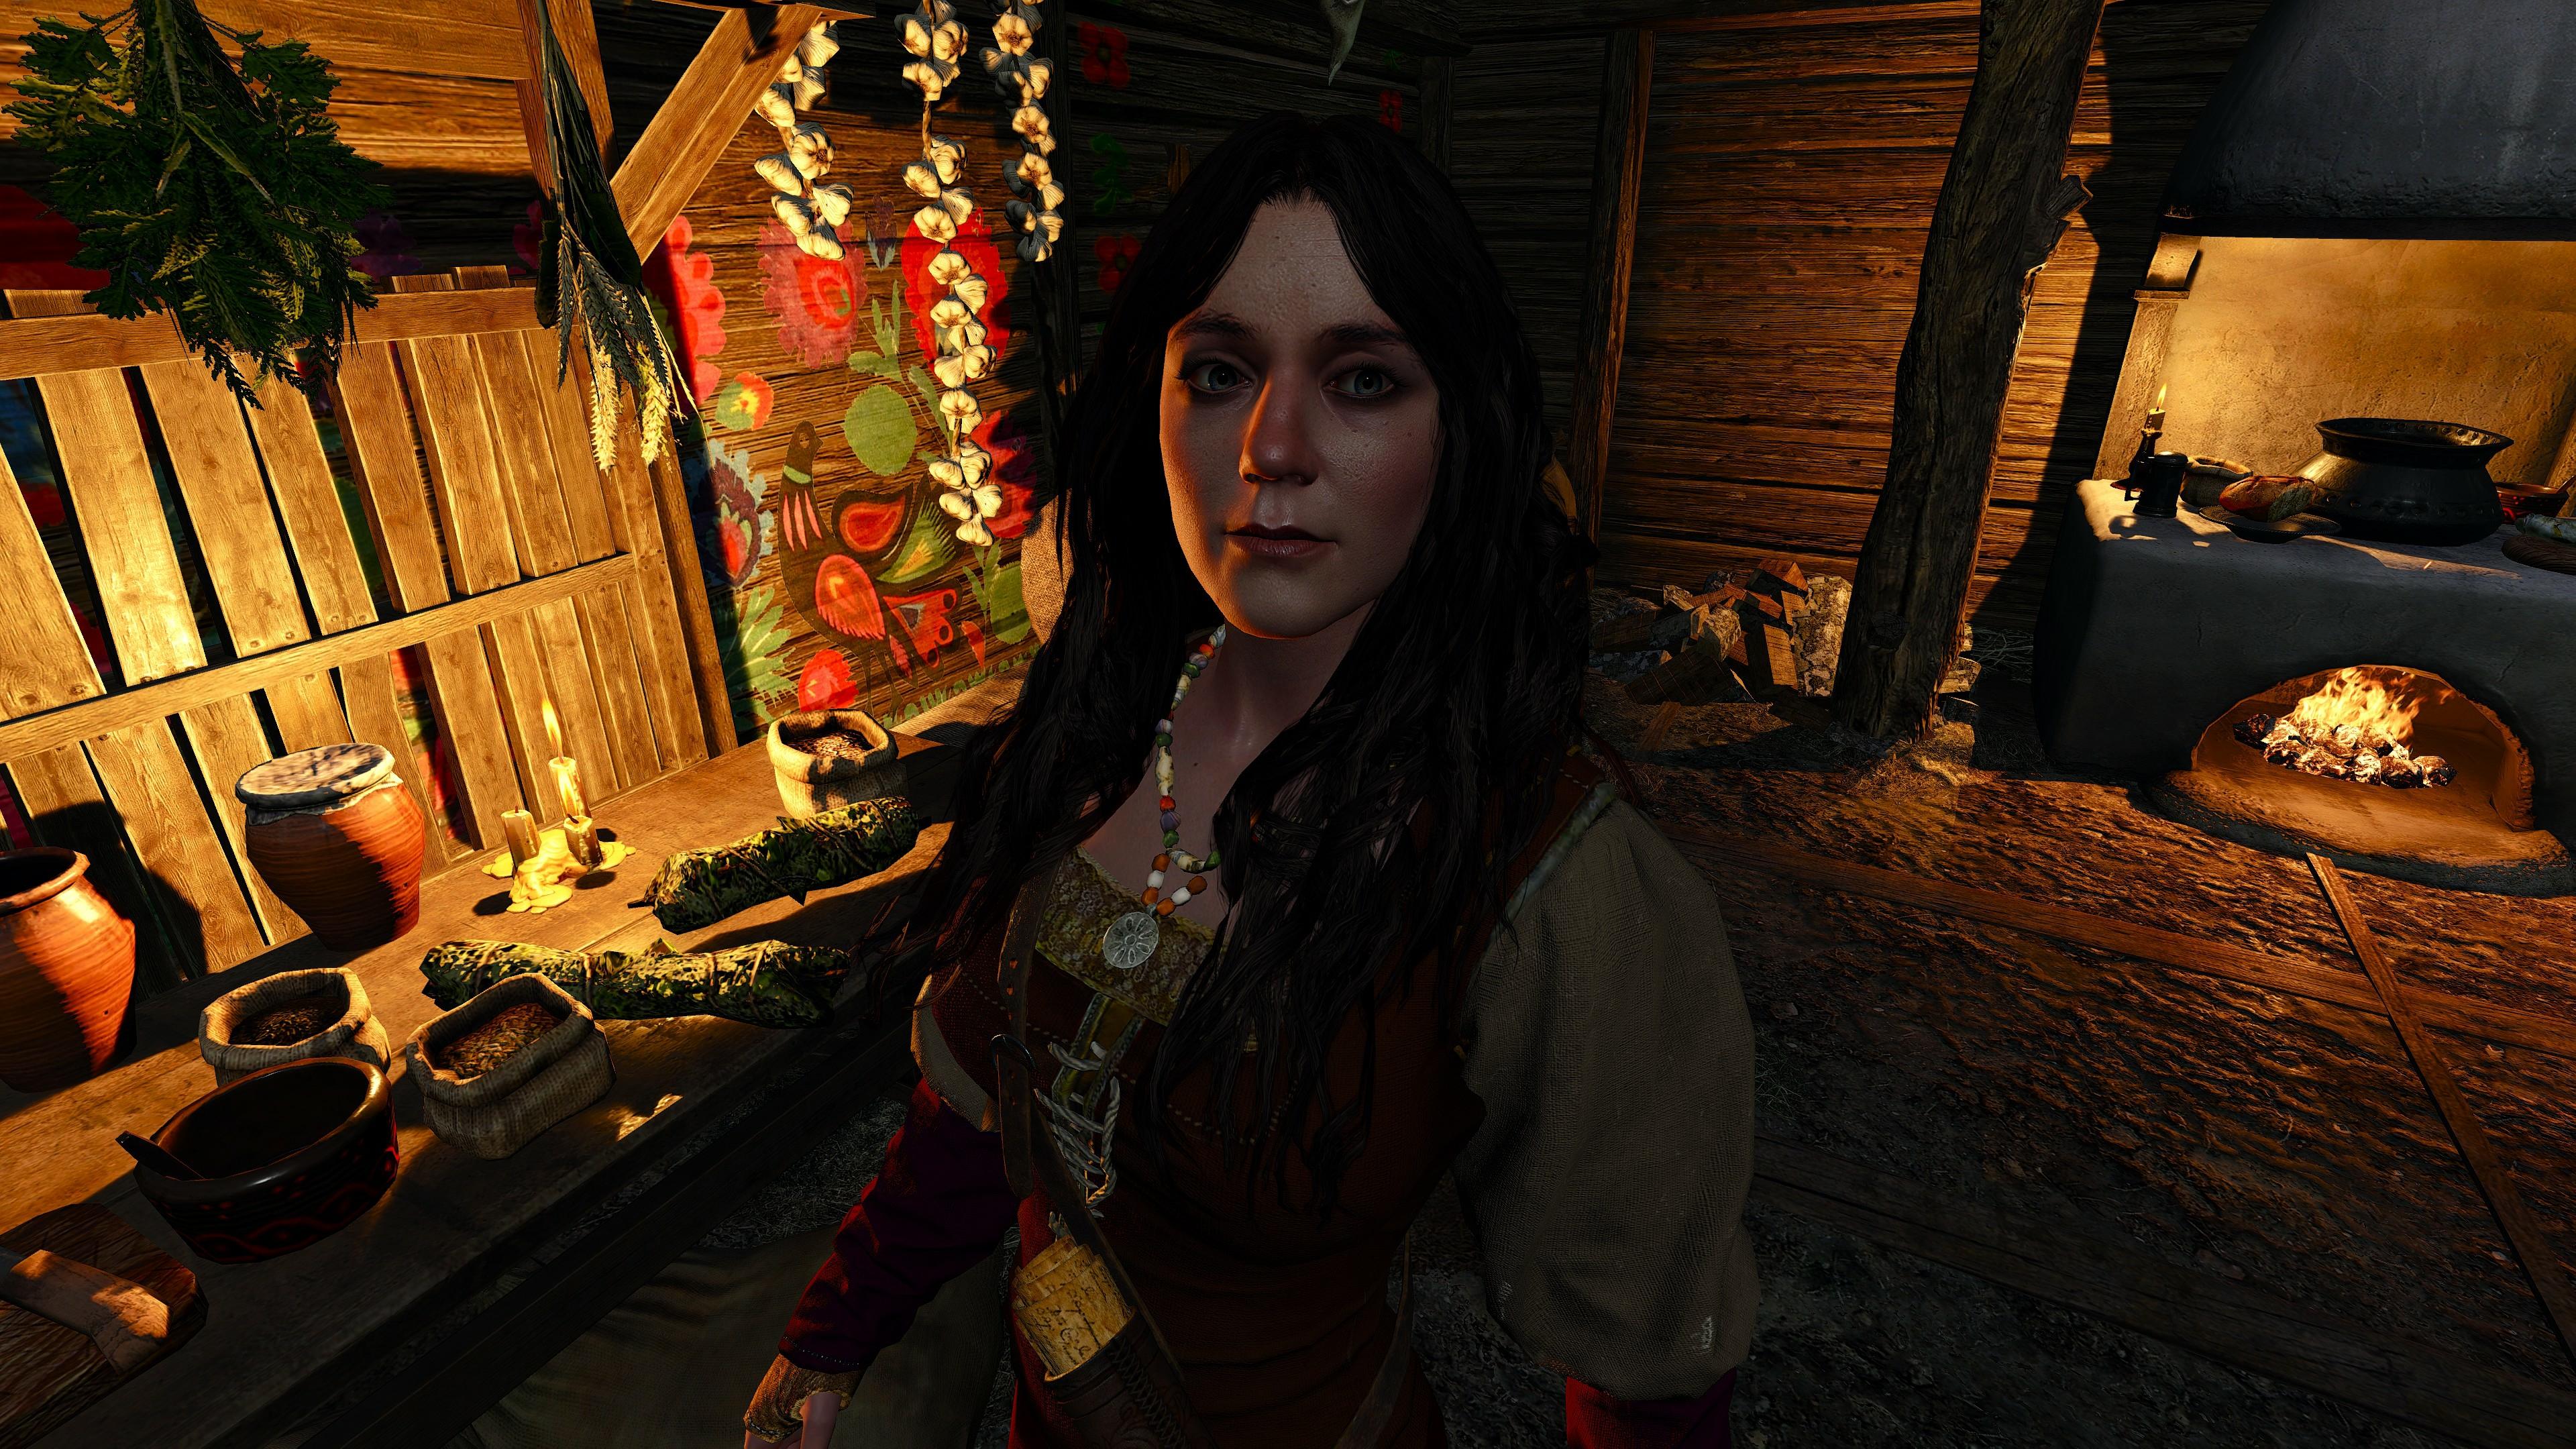 The Witcher 3 Screenshot 2020.07.19 - 20.50.49.jpg - The Witcher 3: Wild Hunt